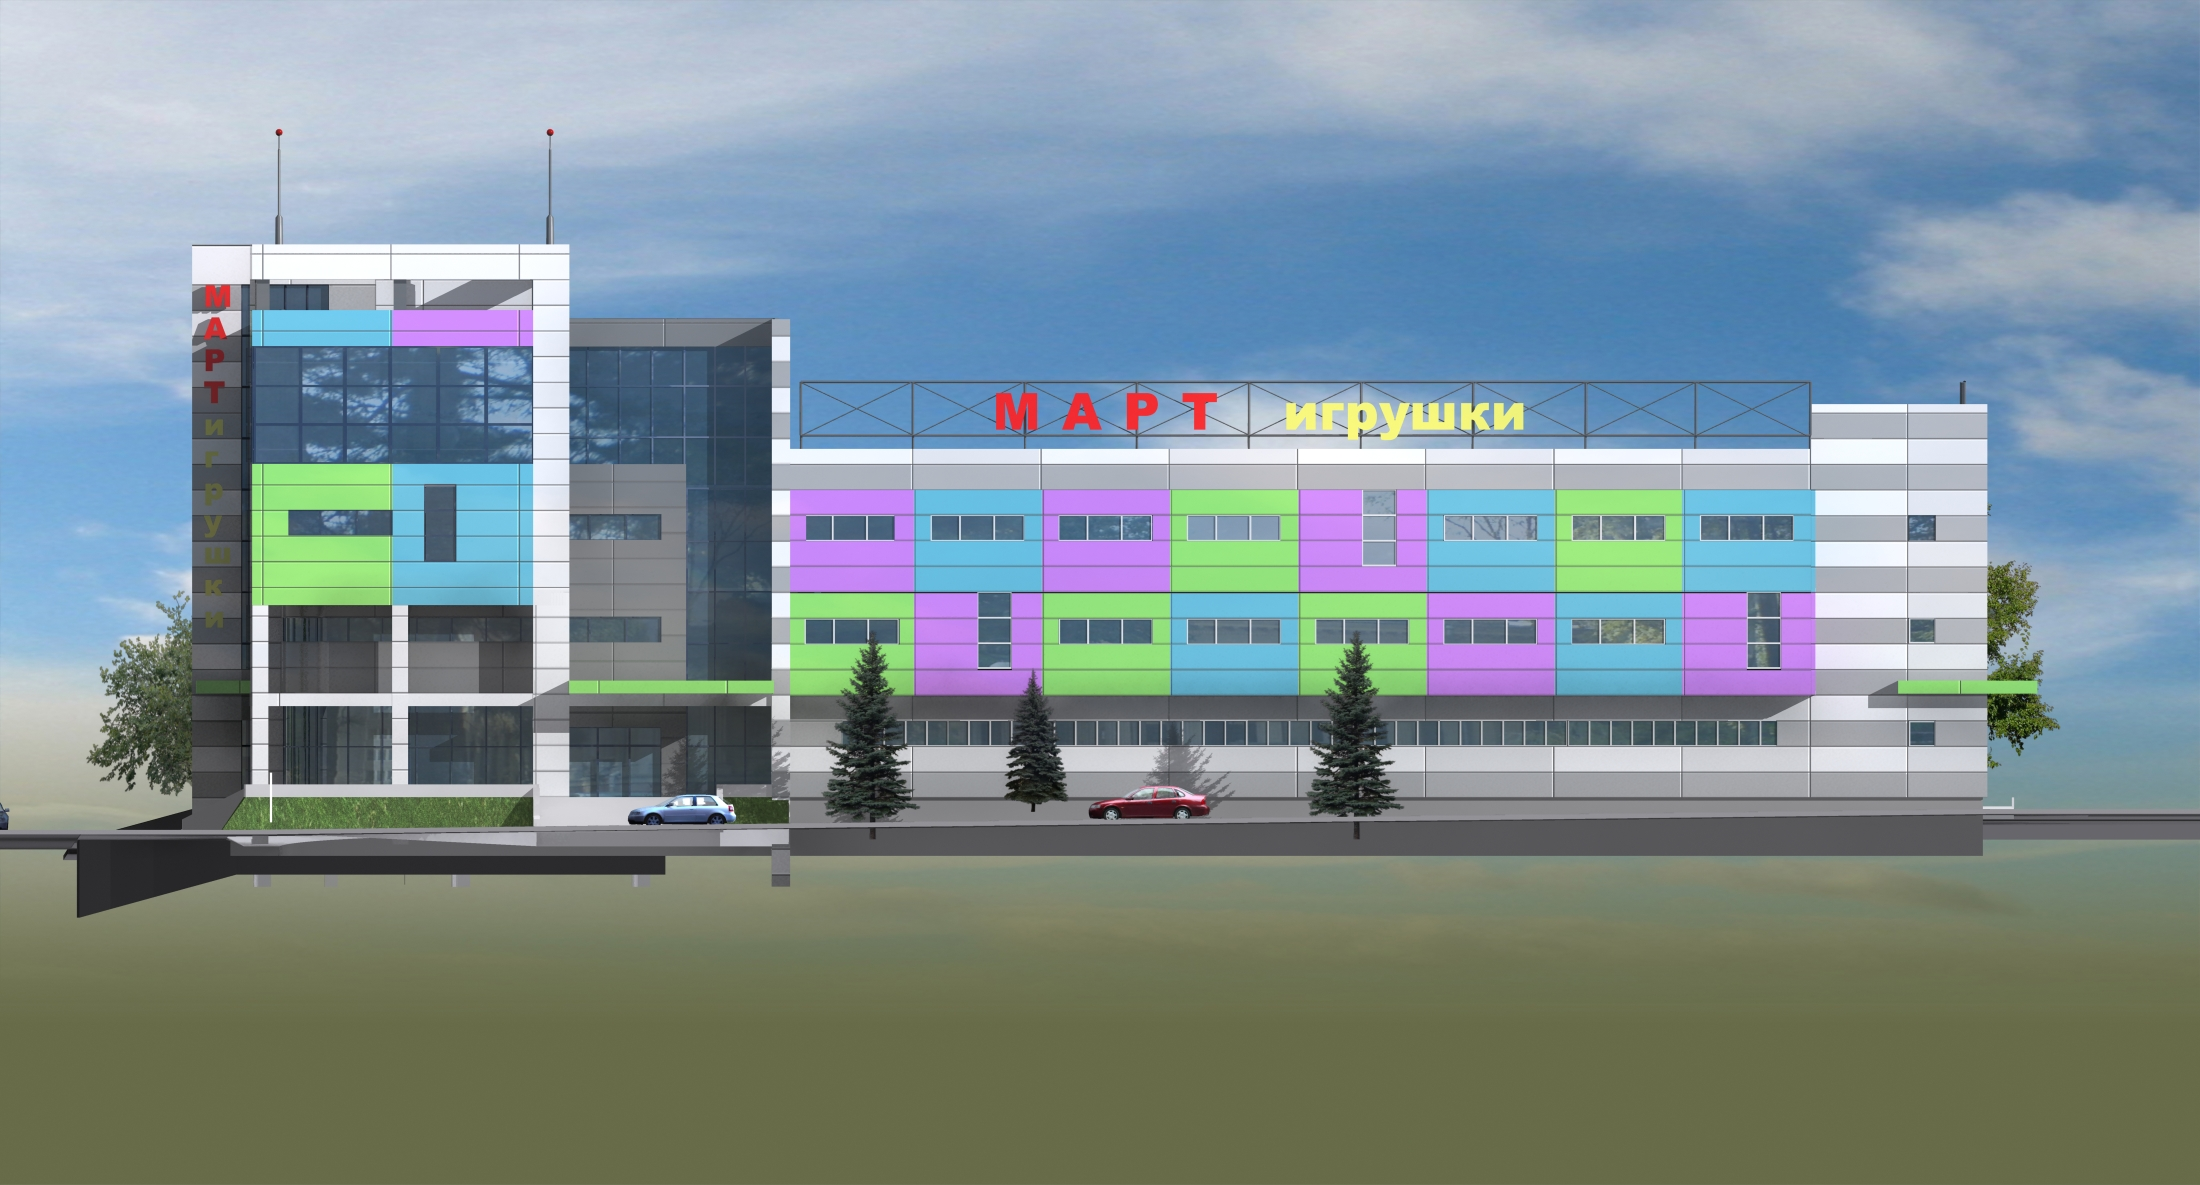 Проект логистического комплекса. Фасад